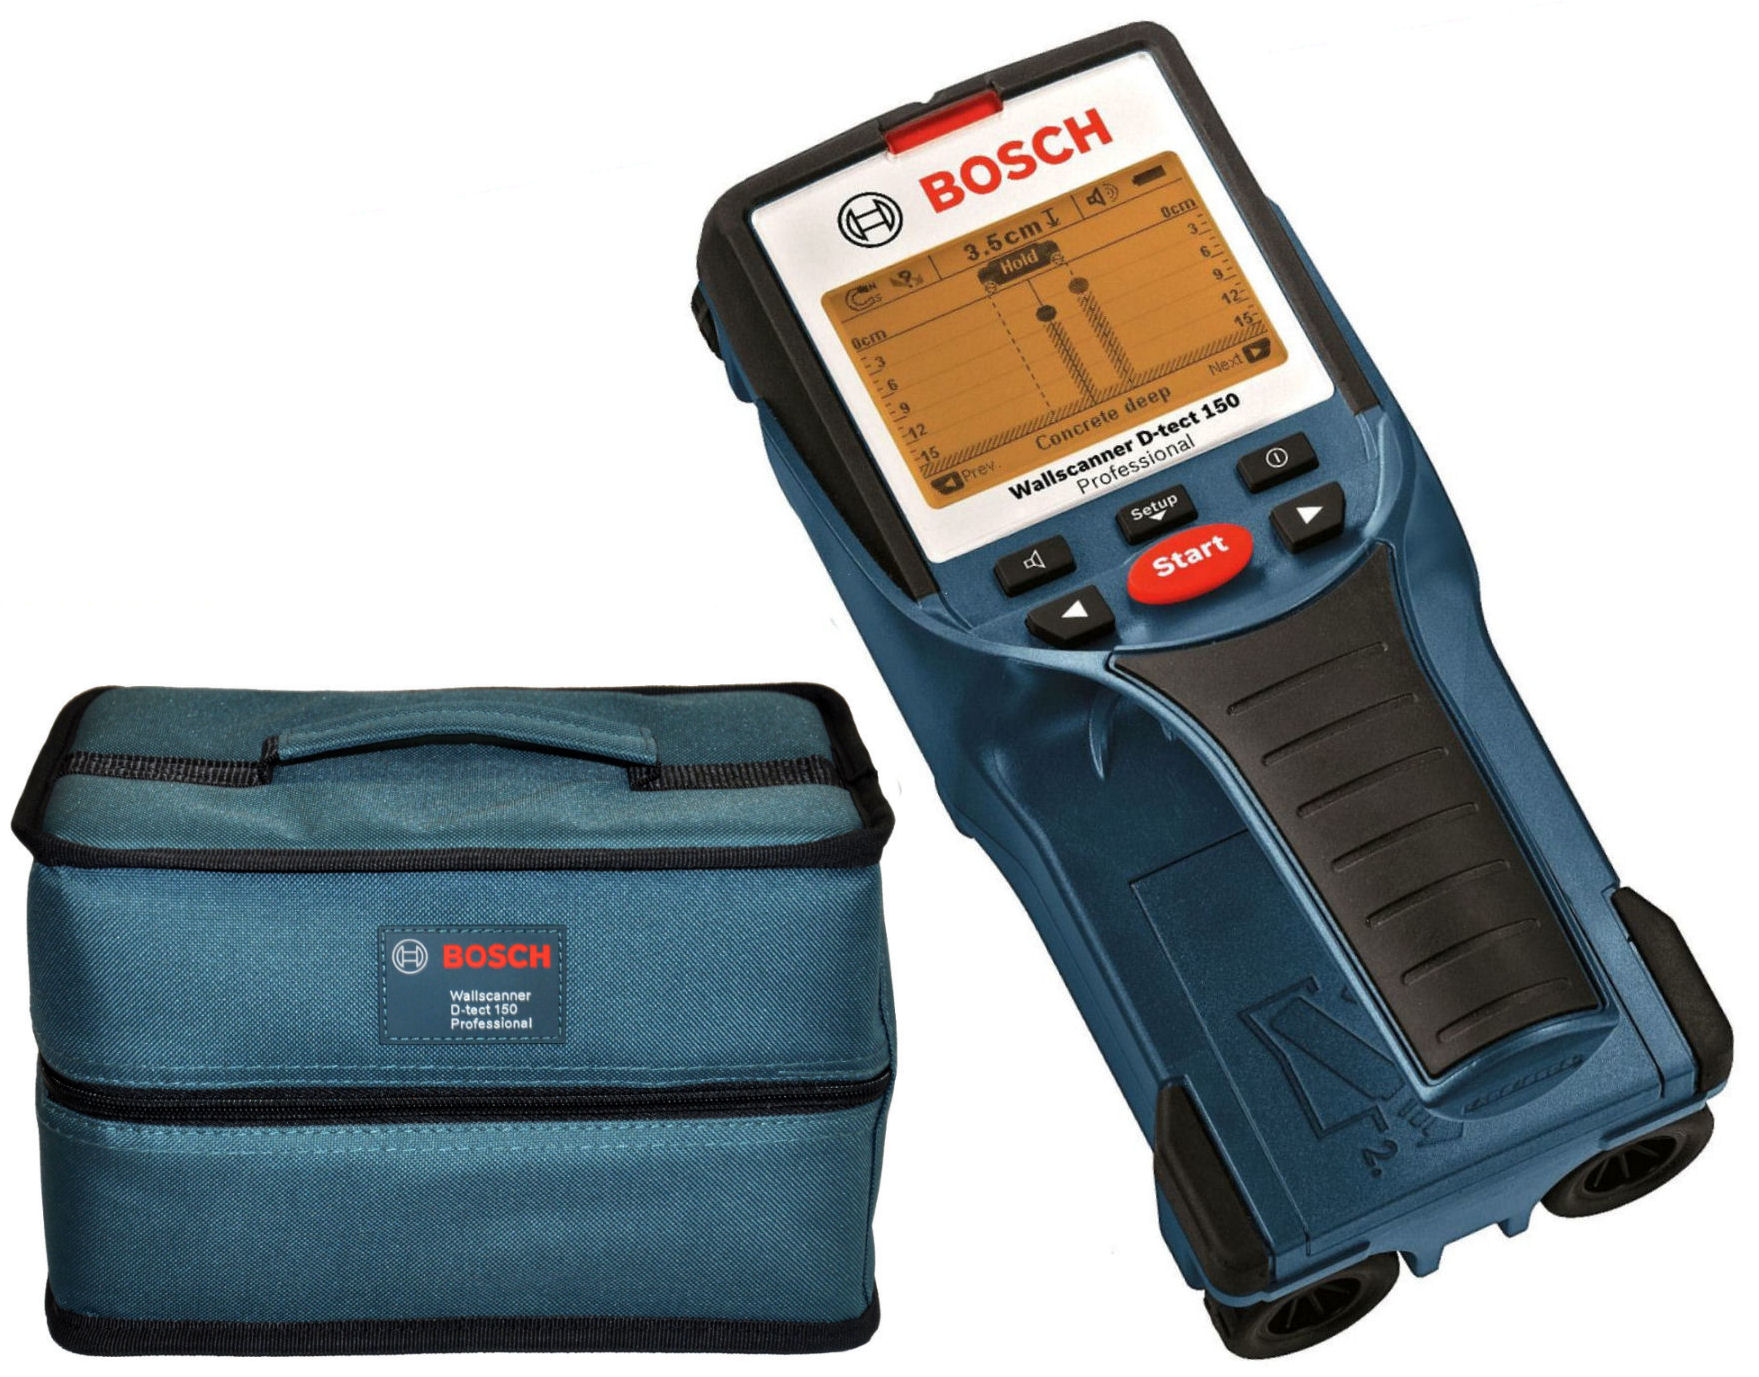 Digitálny Wallscanner D-TECT 150 Detektor Bosch